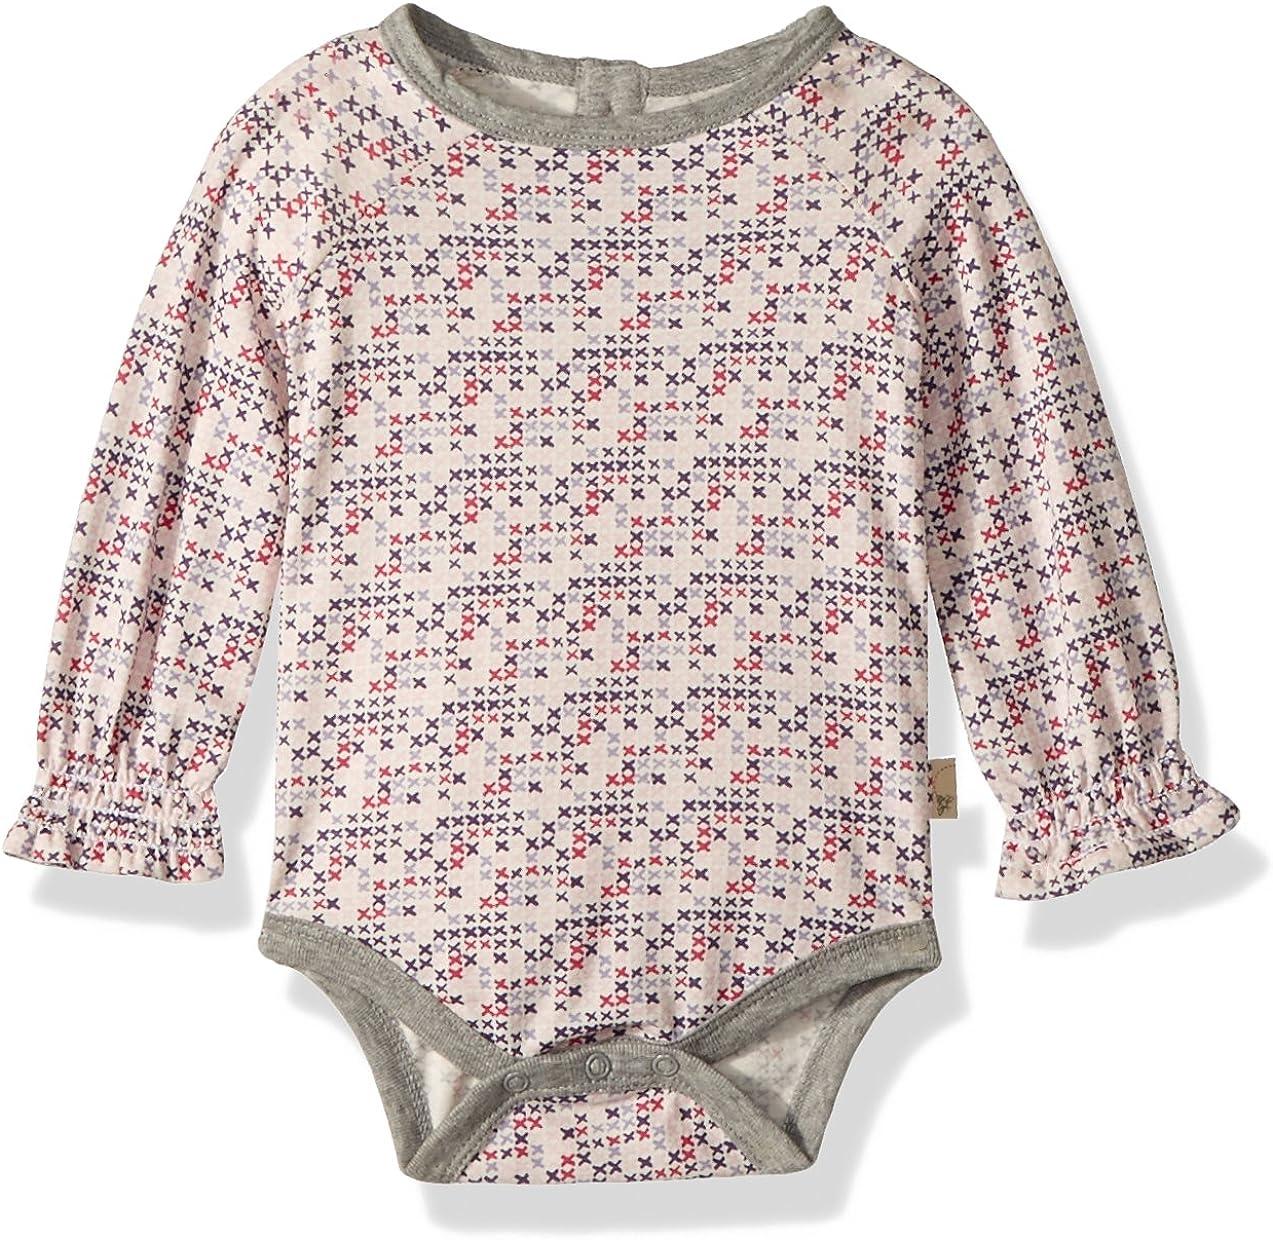 Burt's Bees Baby - Baby Girls Bodysuit, Short Sleeve and Long Sleeve One-Piece Bodysuits, 100% Organic Cotton